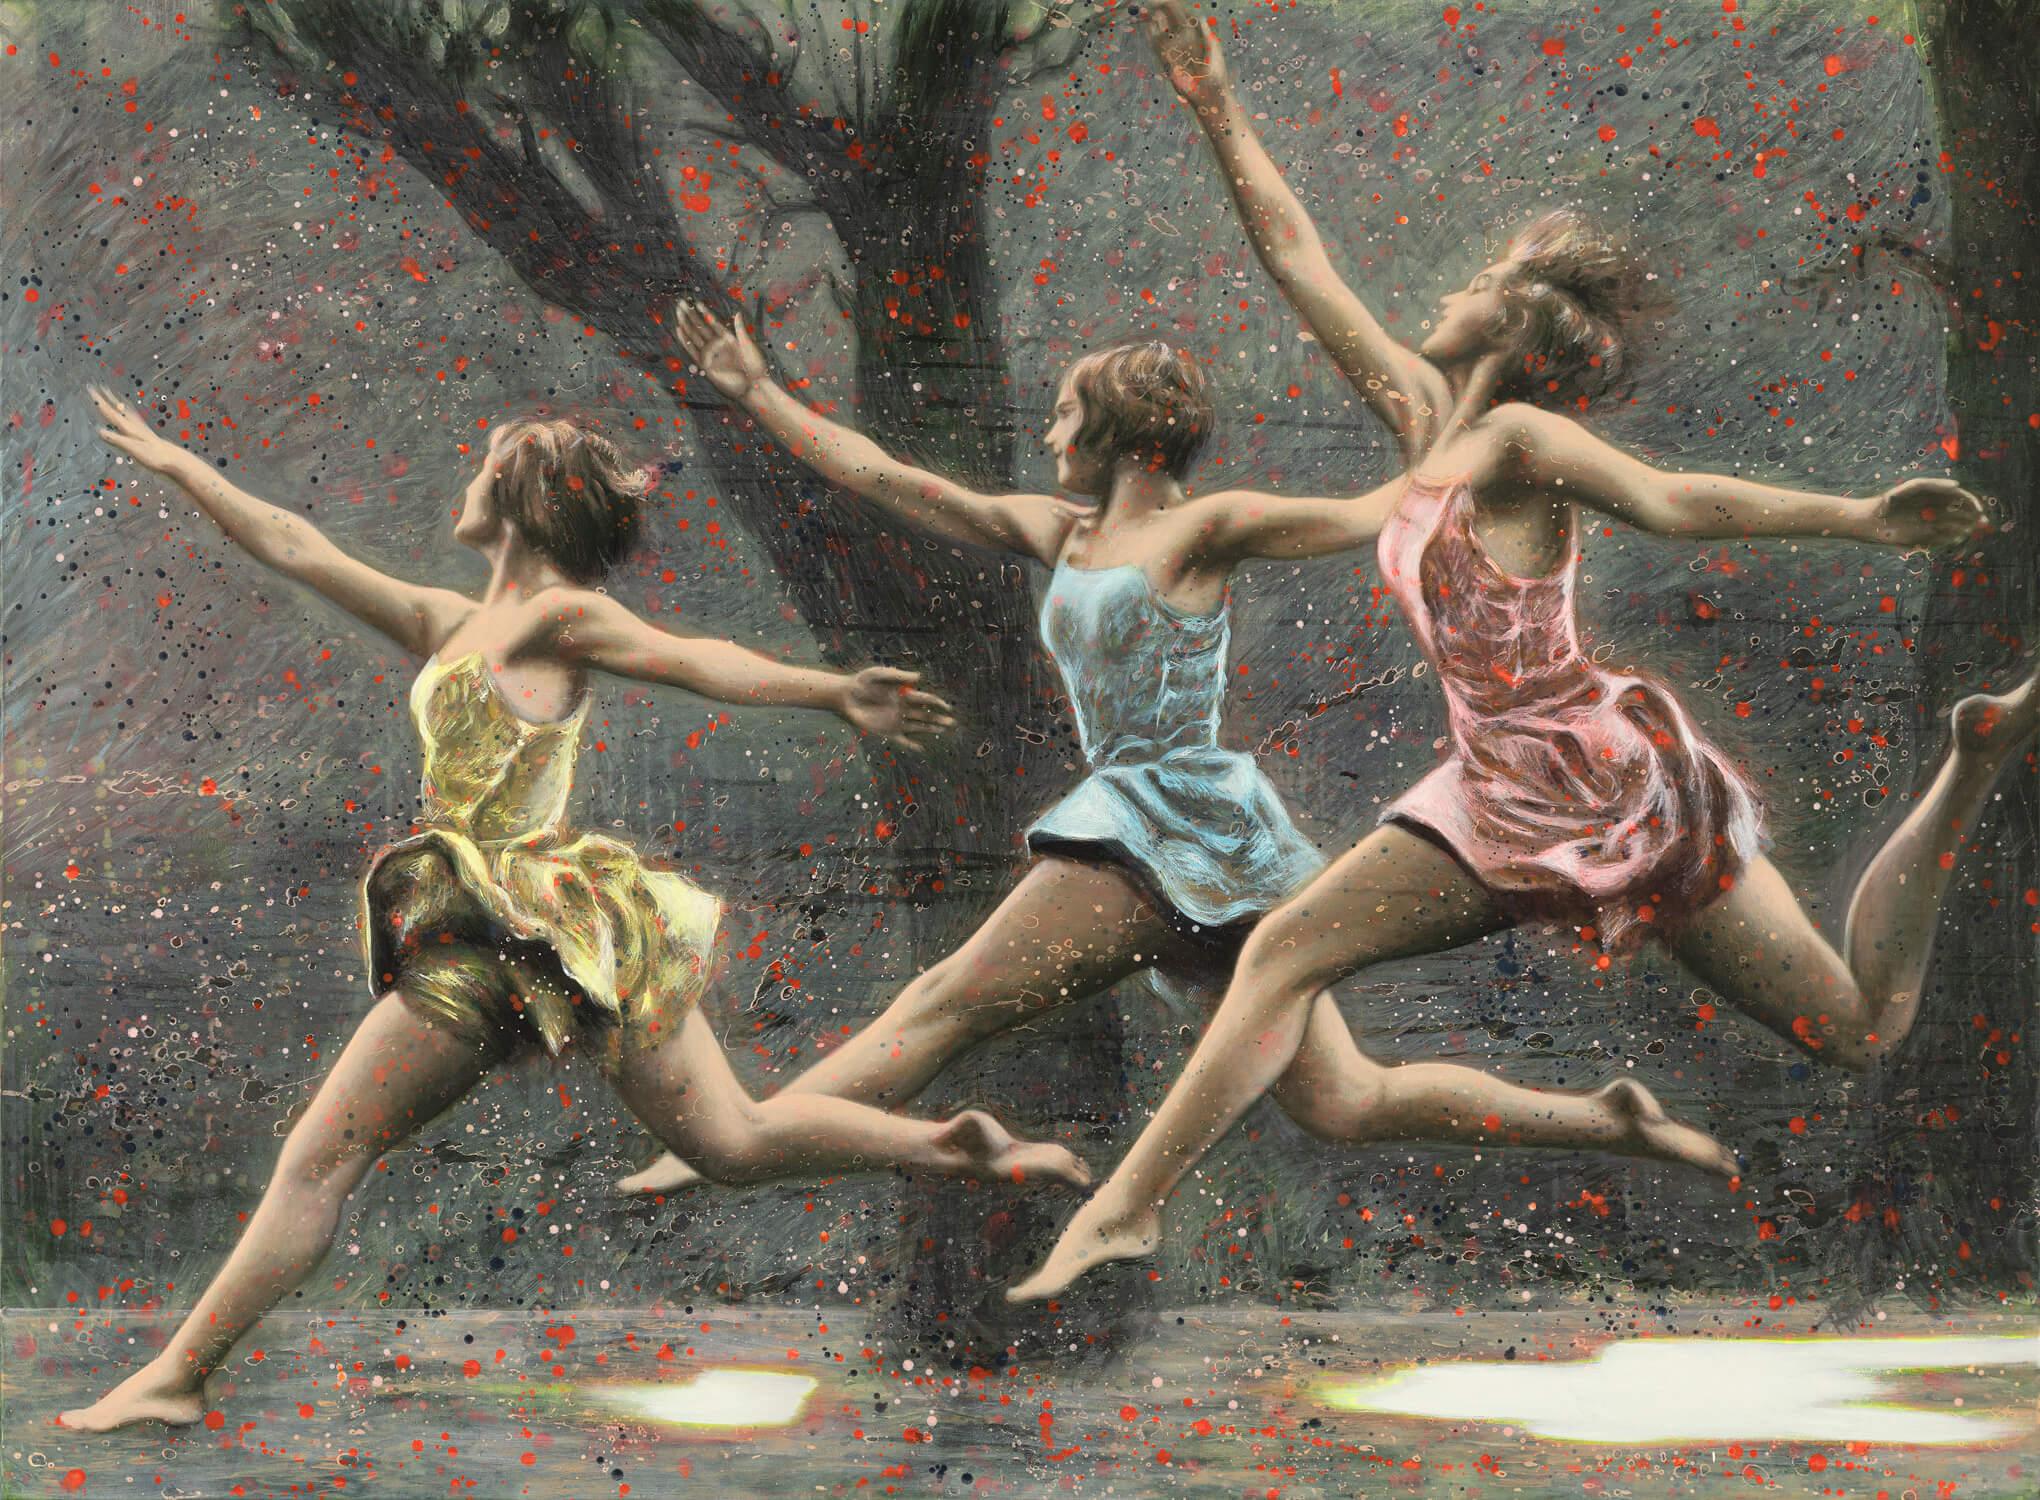 »Daughters« / 2020 / Acryl auf Leinwand / 170cm x 230cm